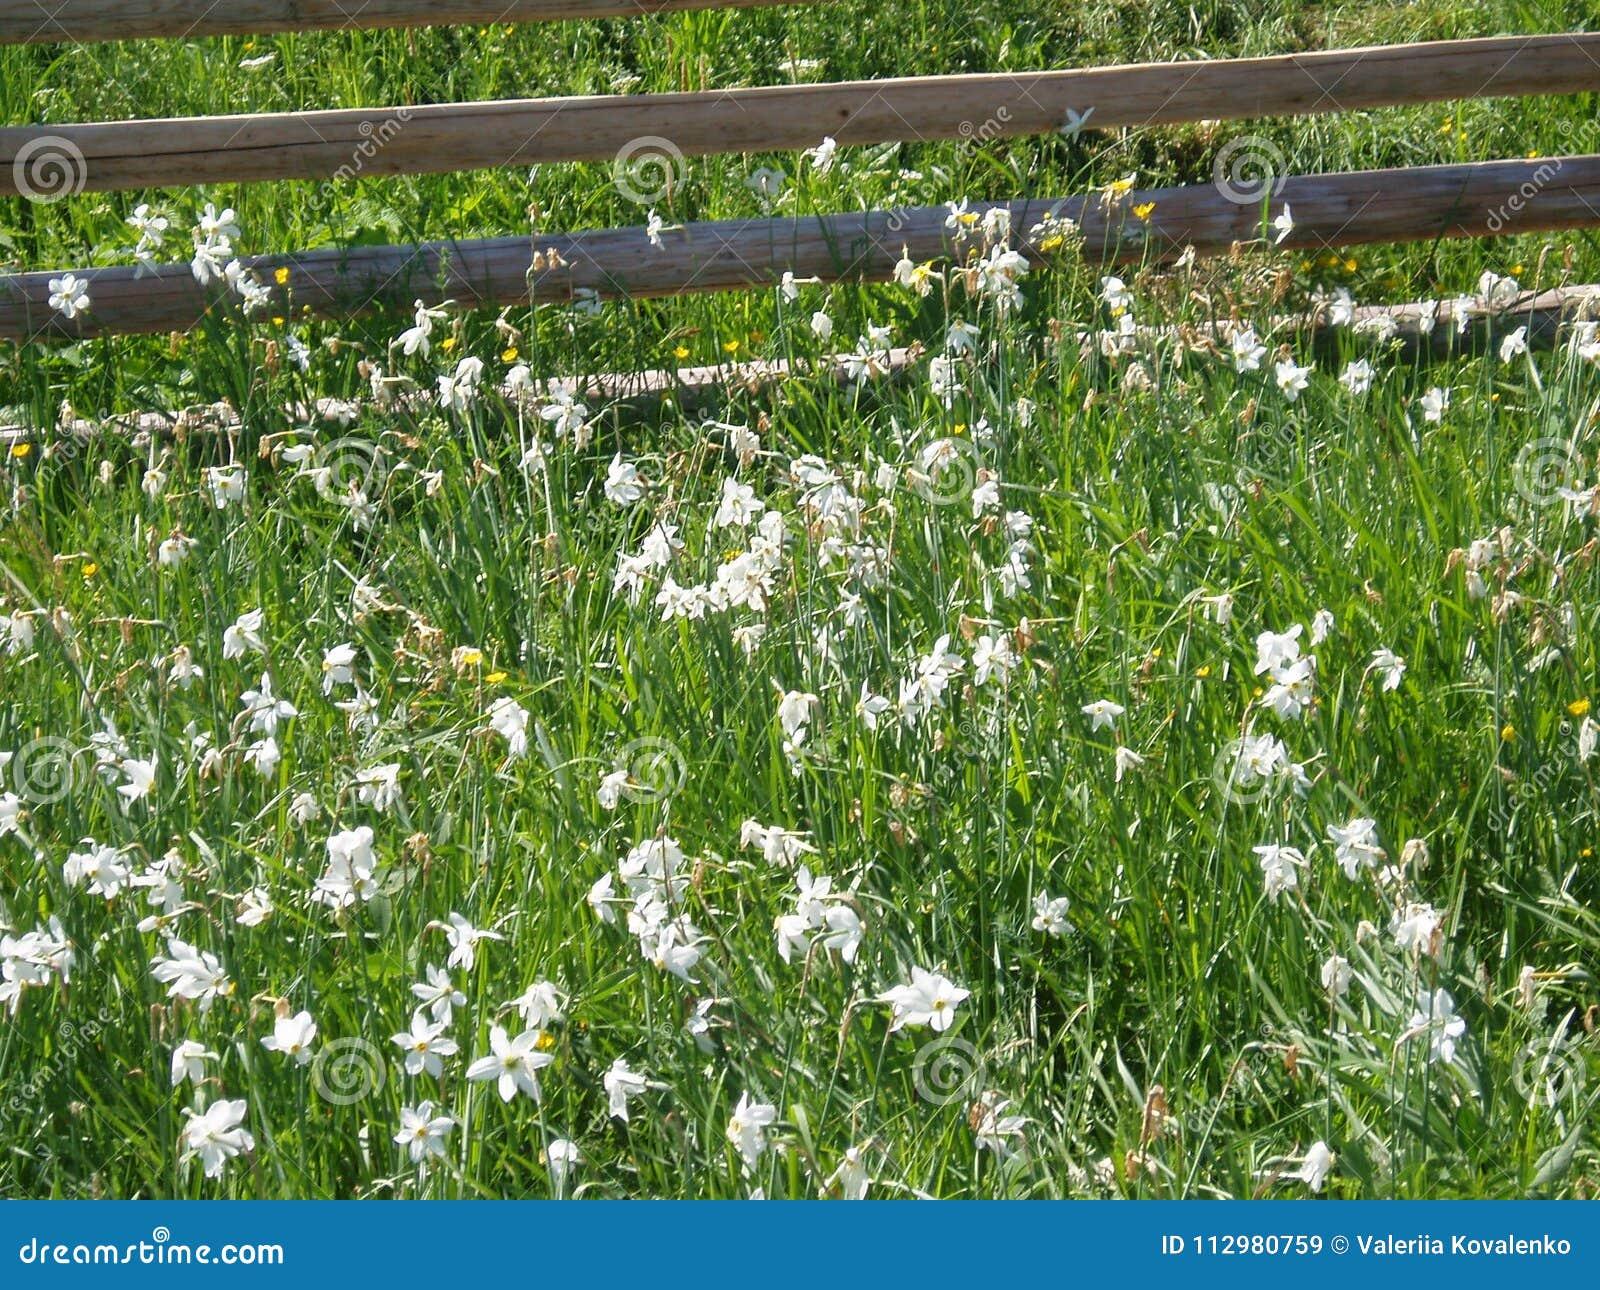 Flowers in Ukraine